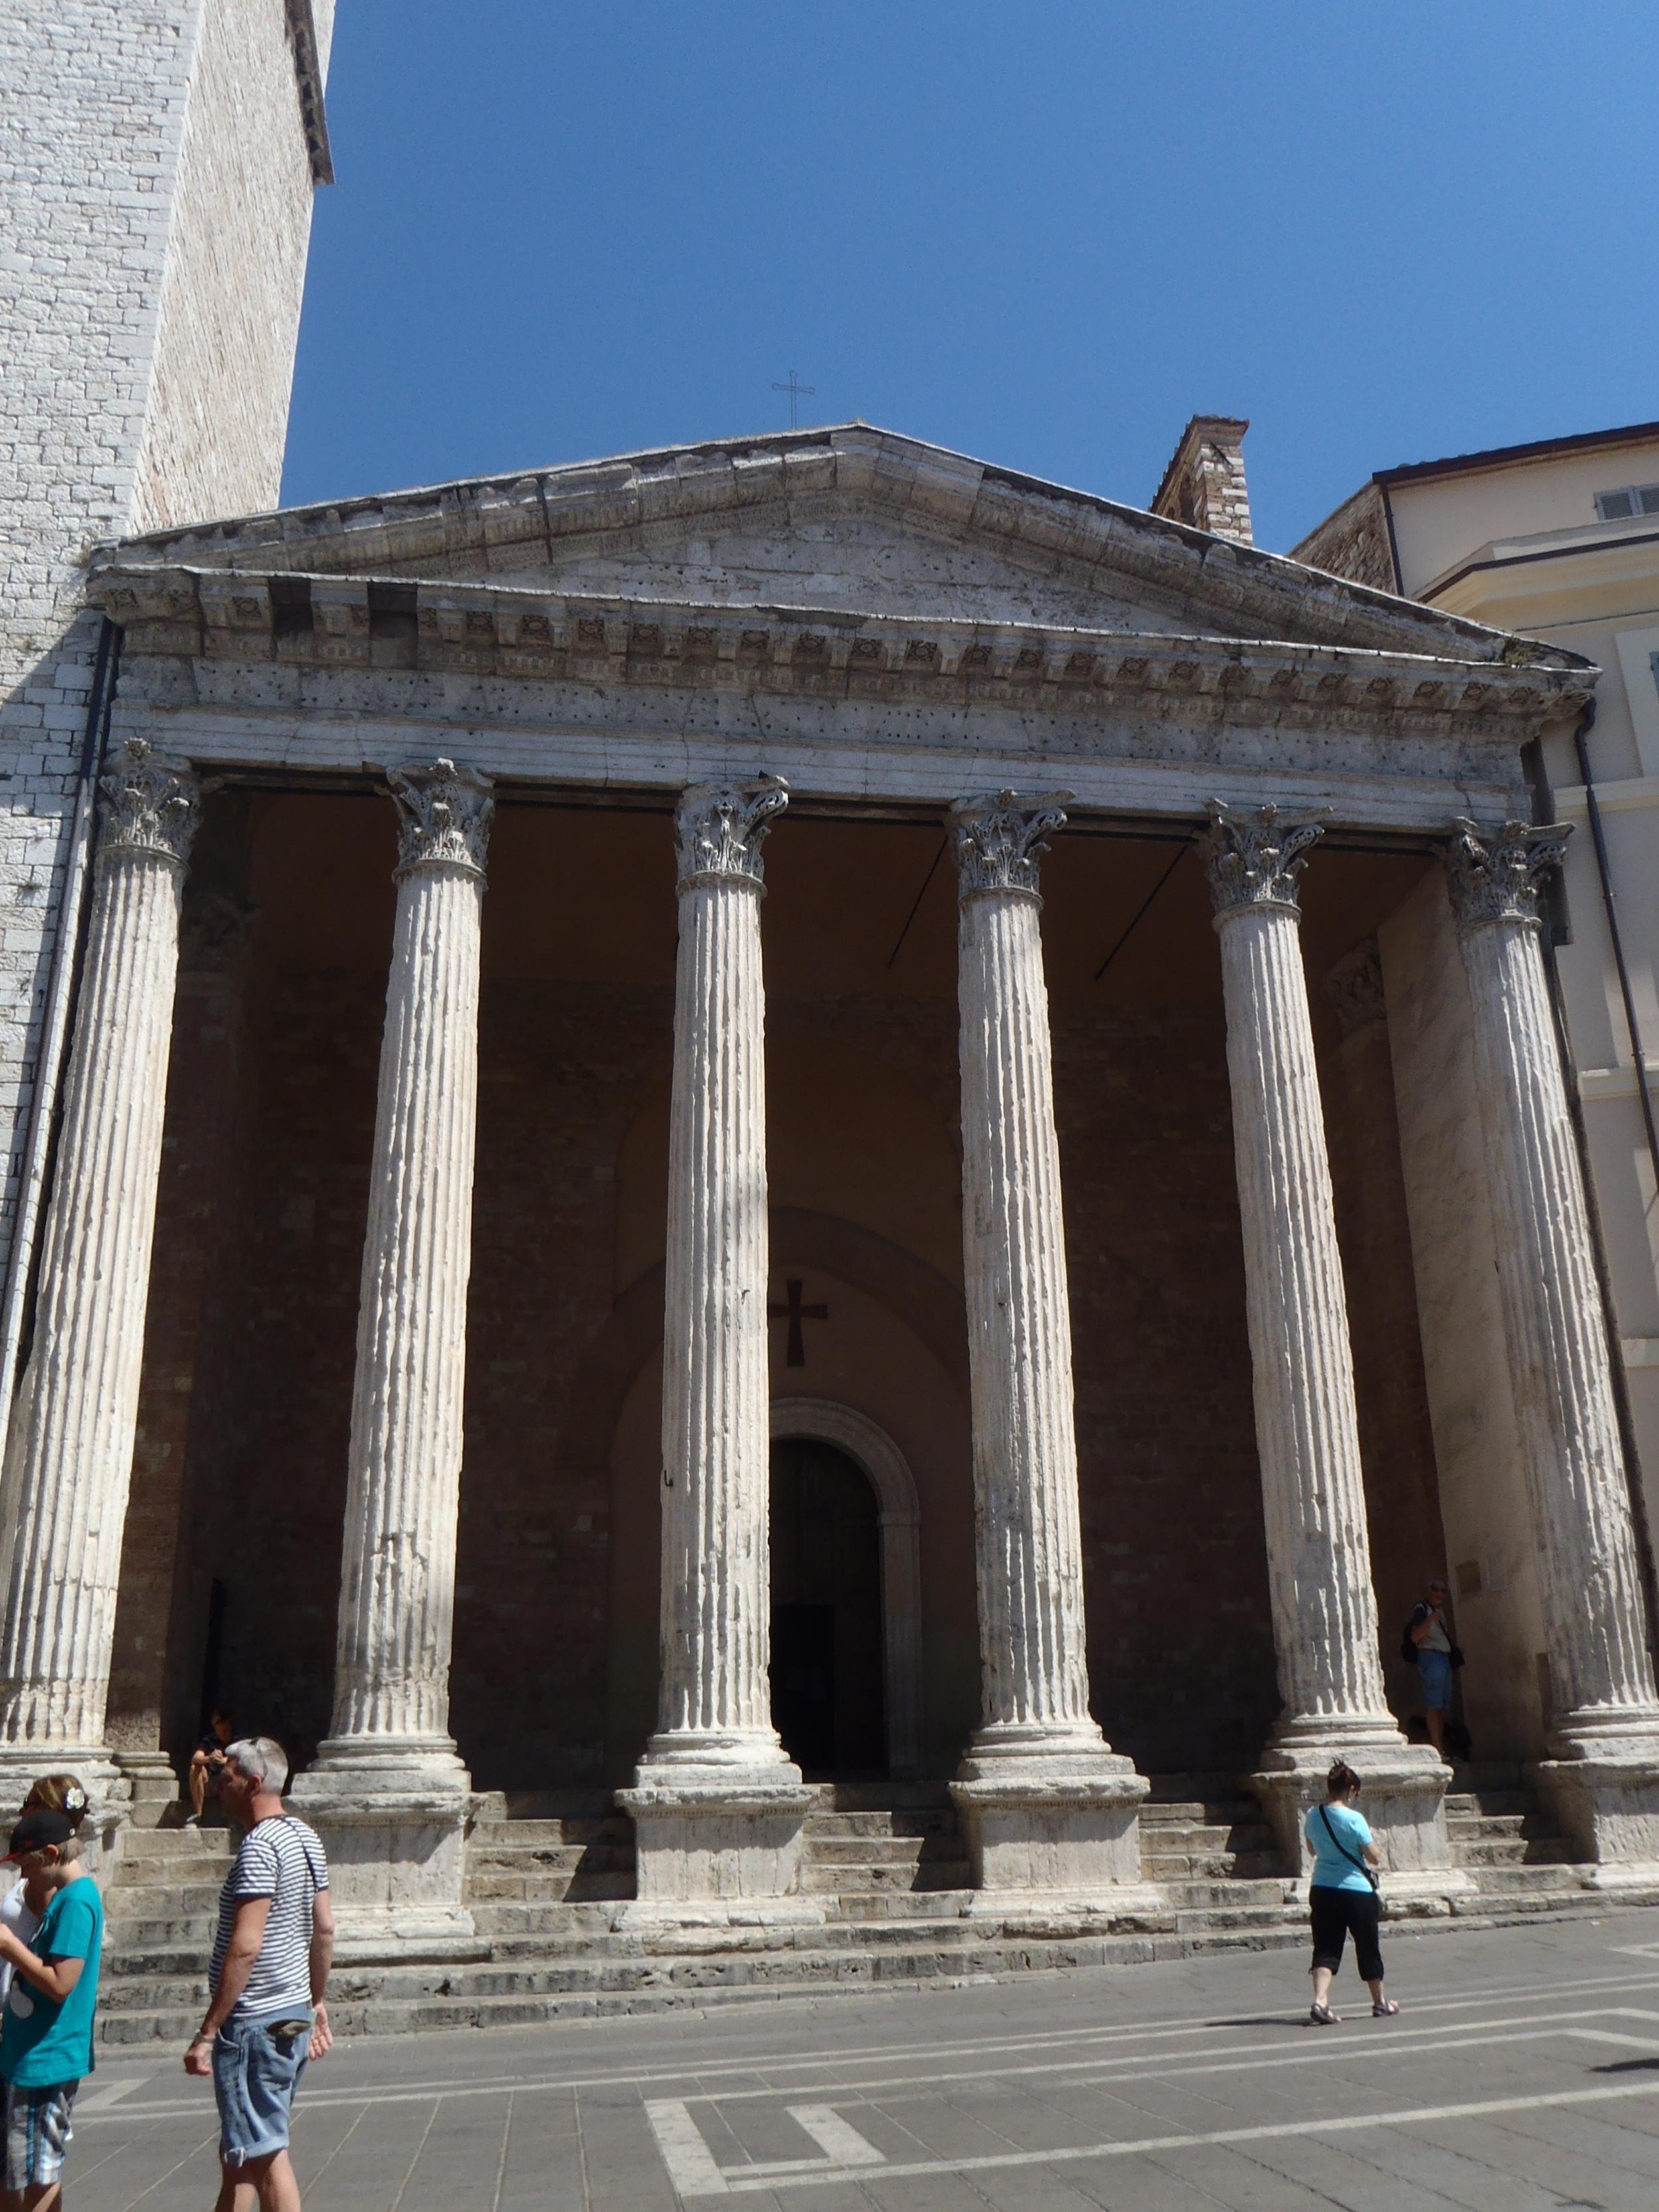 CRO Italy web 2012 - 11.JPG